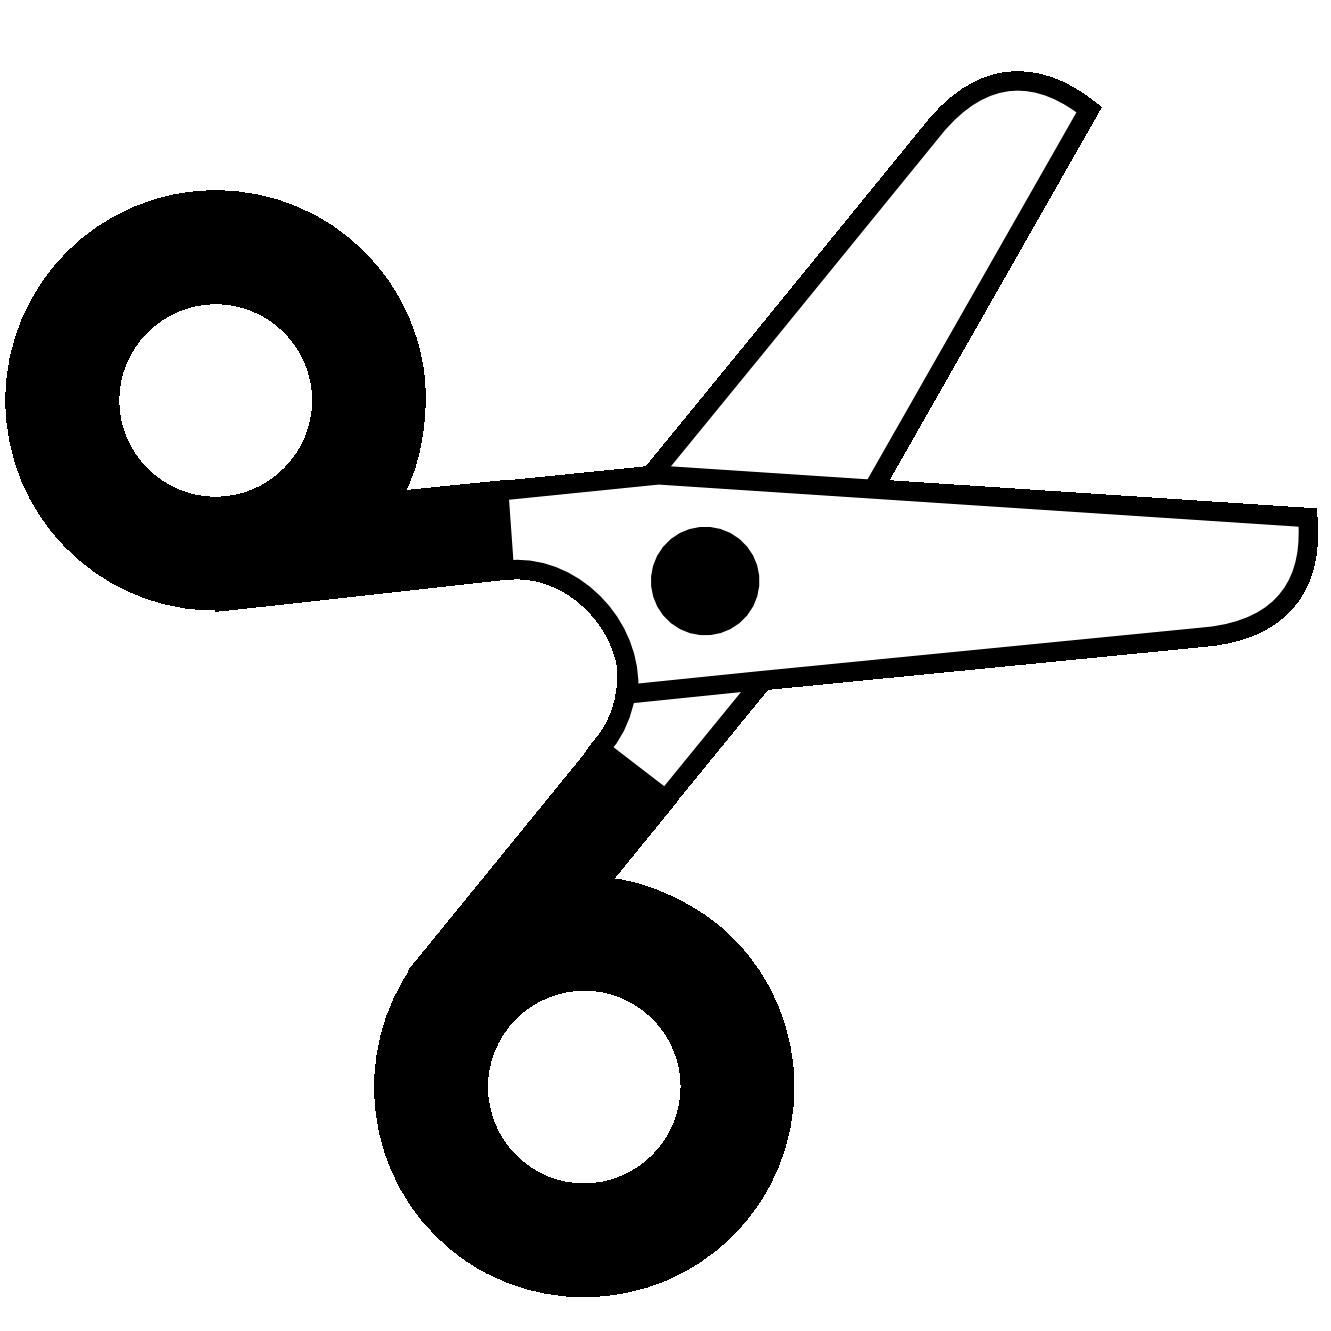 Scissors vector clipart